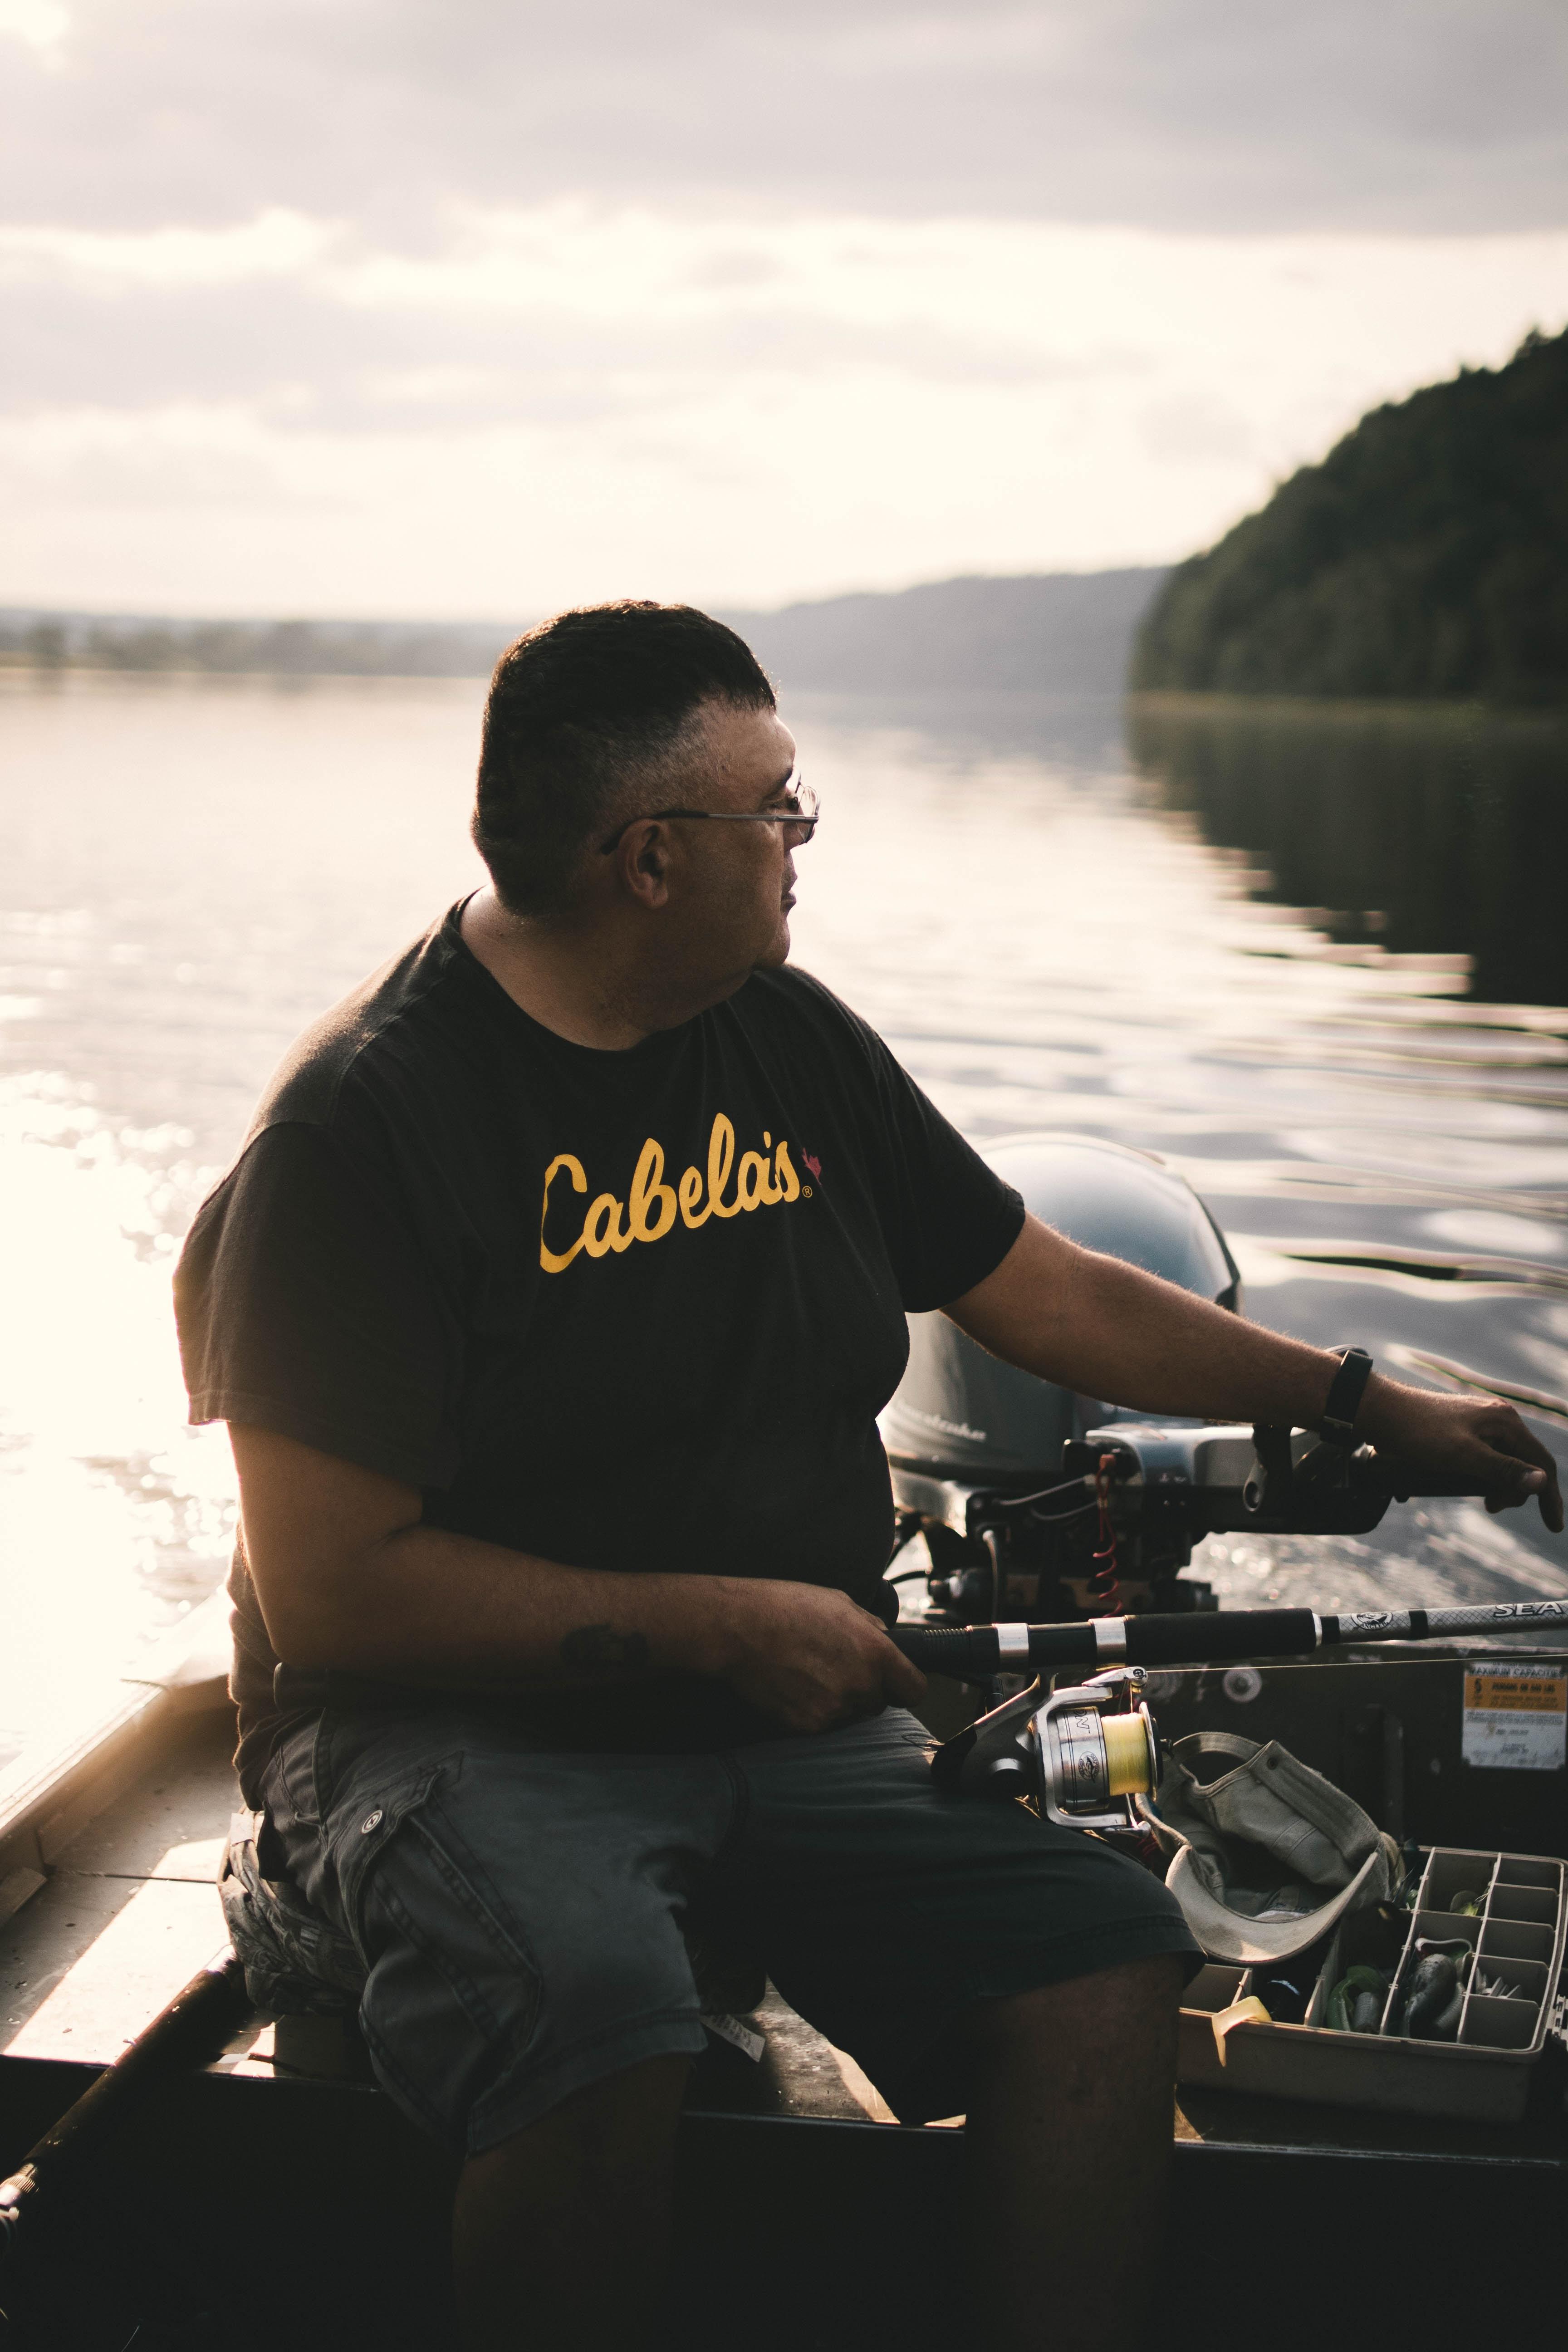 man on boat holding fishing rod